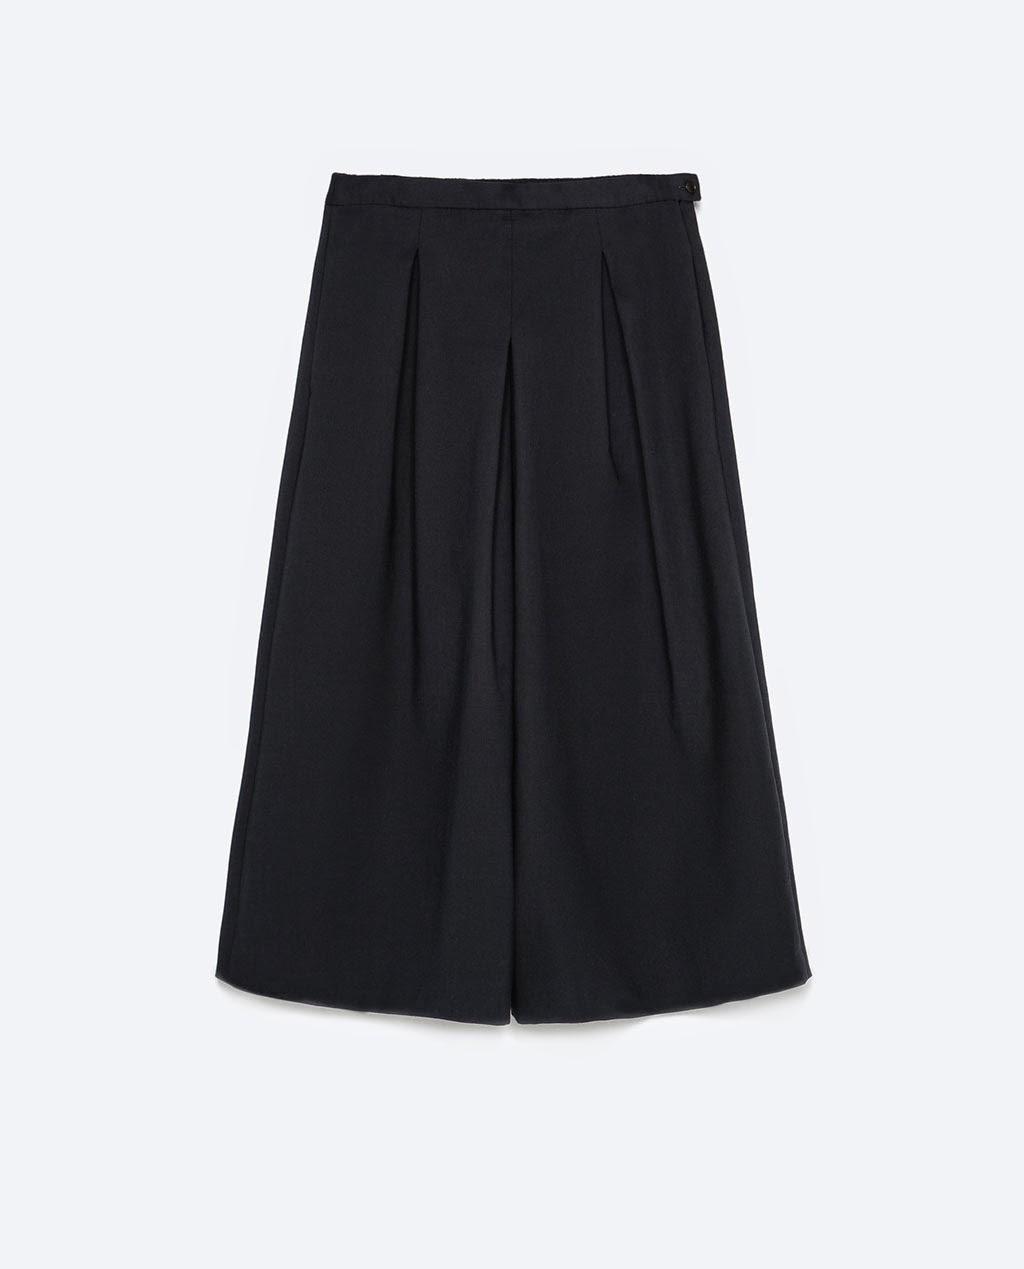 Patron Gratis Falda Pantalon Culotte Para Todas Las Tallas Yo Elijo Coser